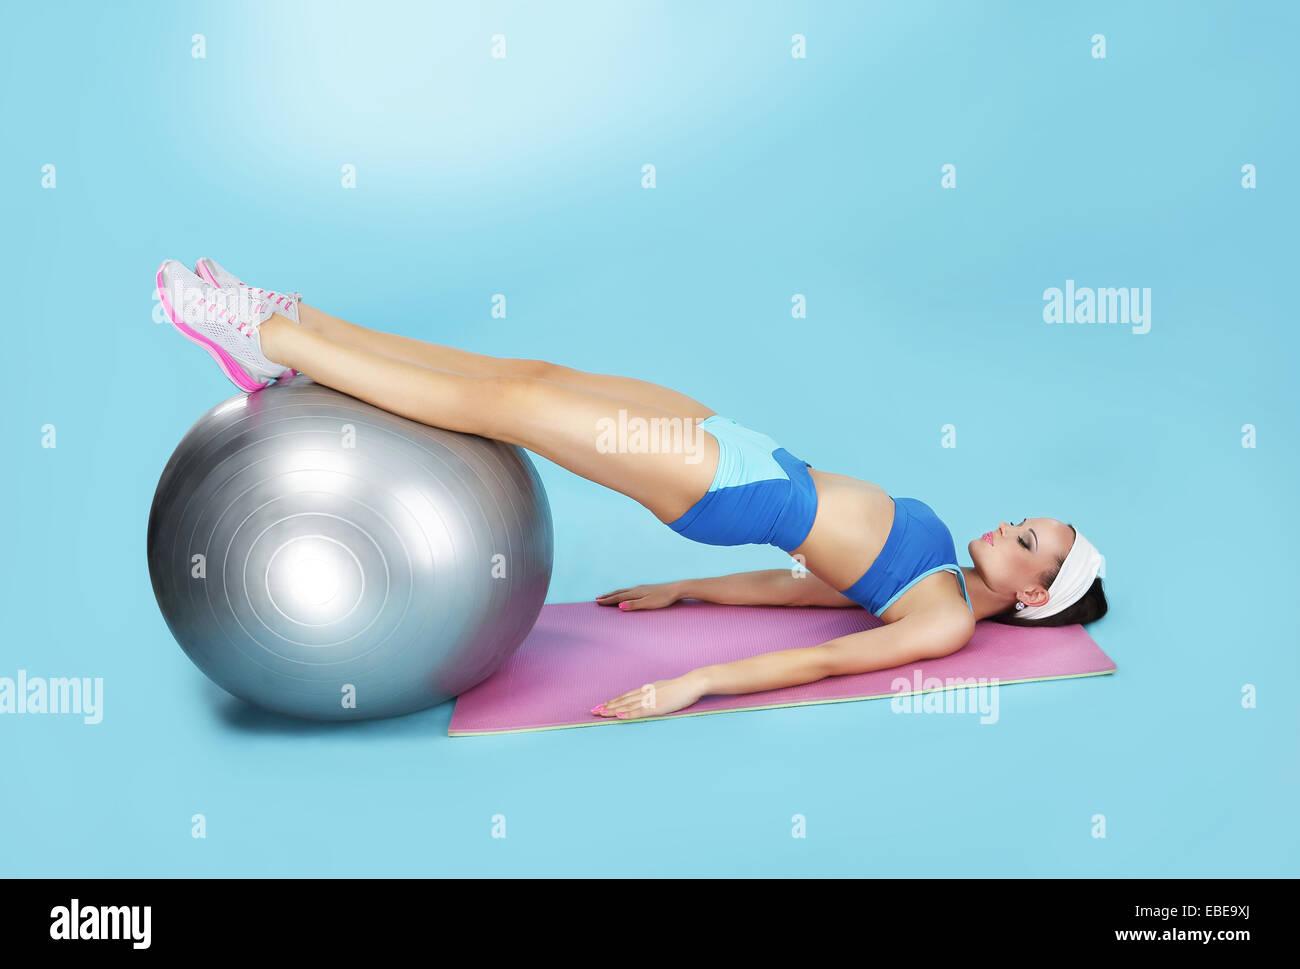 Ejercicio abdominal. Mujer deportiva con Pelota Fitness Imagen De Stock